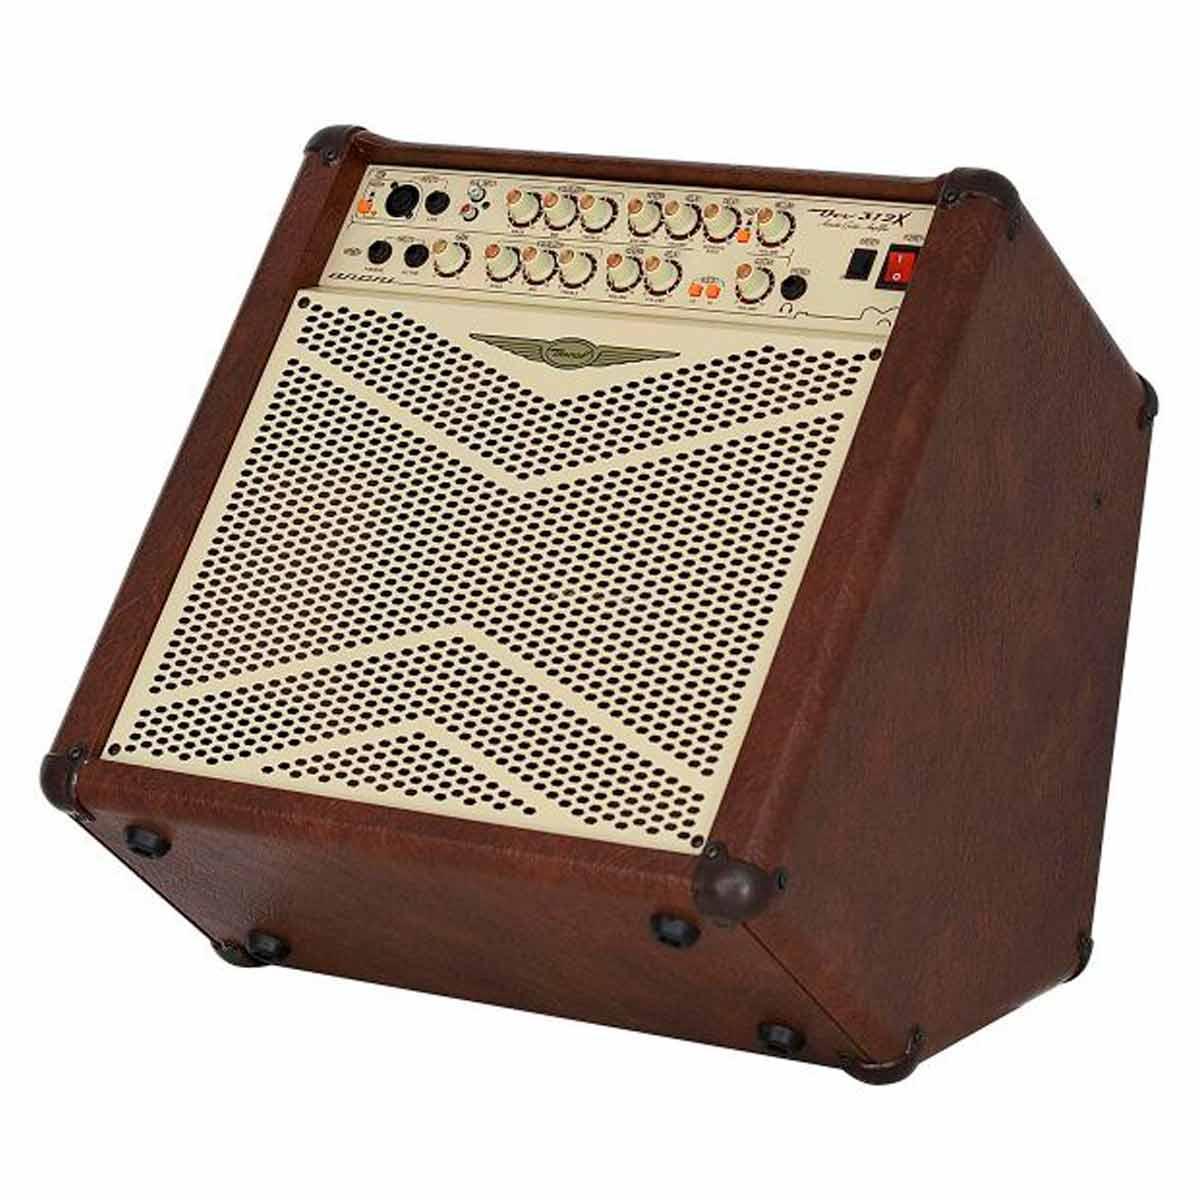 Cubo Amplificador P/ Violão Oneal OCV 312 80Wrms